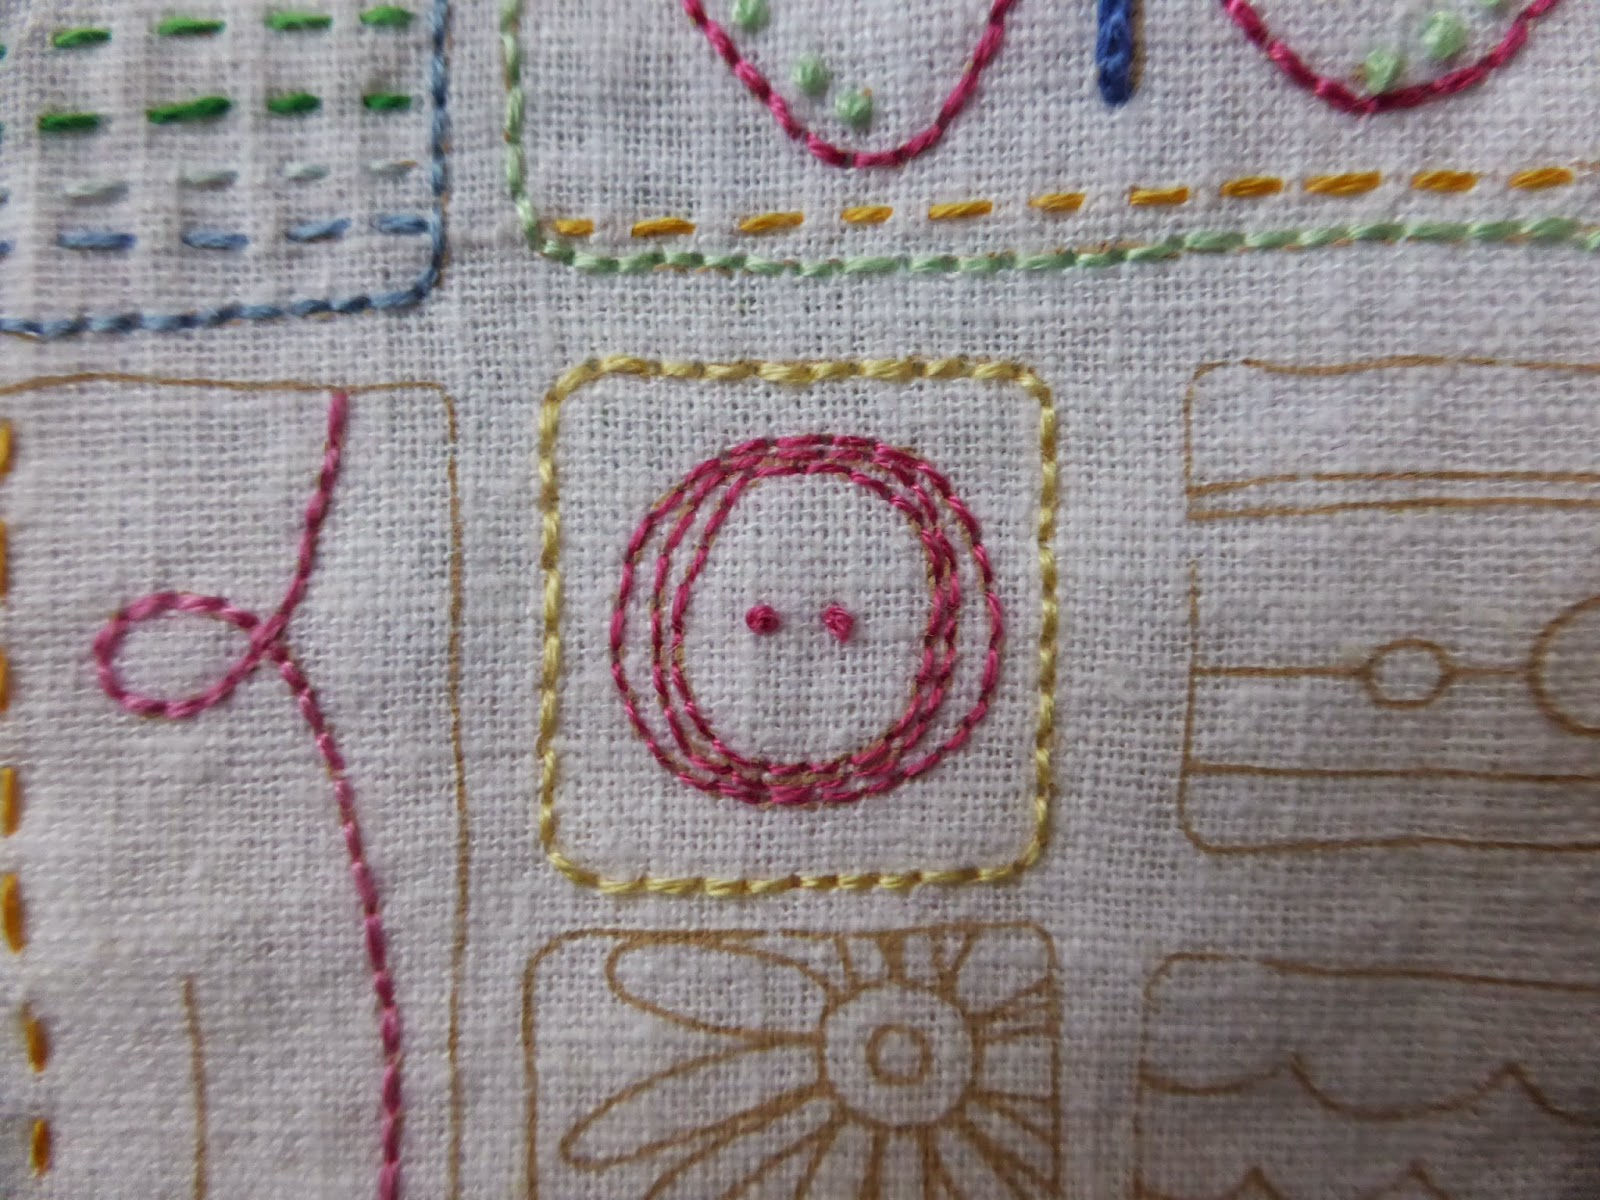 Sew Laugh Love - pattern by Leanne Beasley